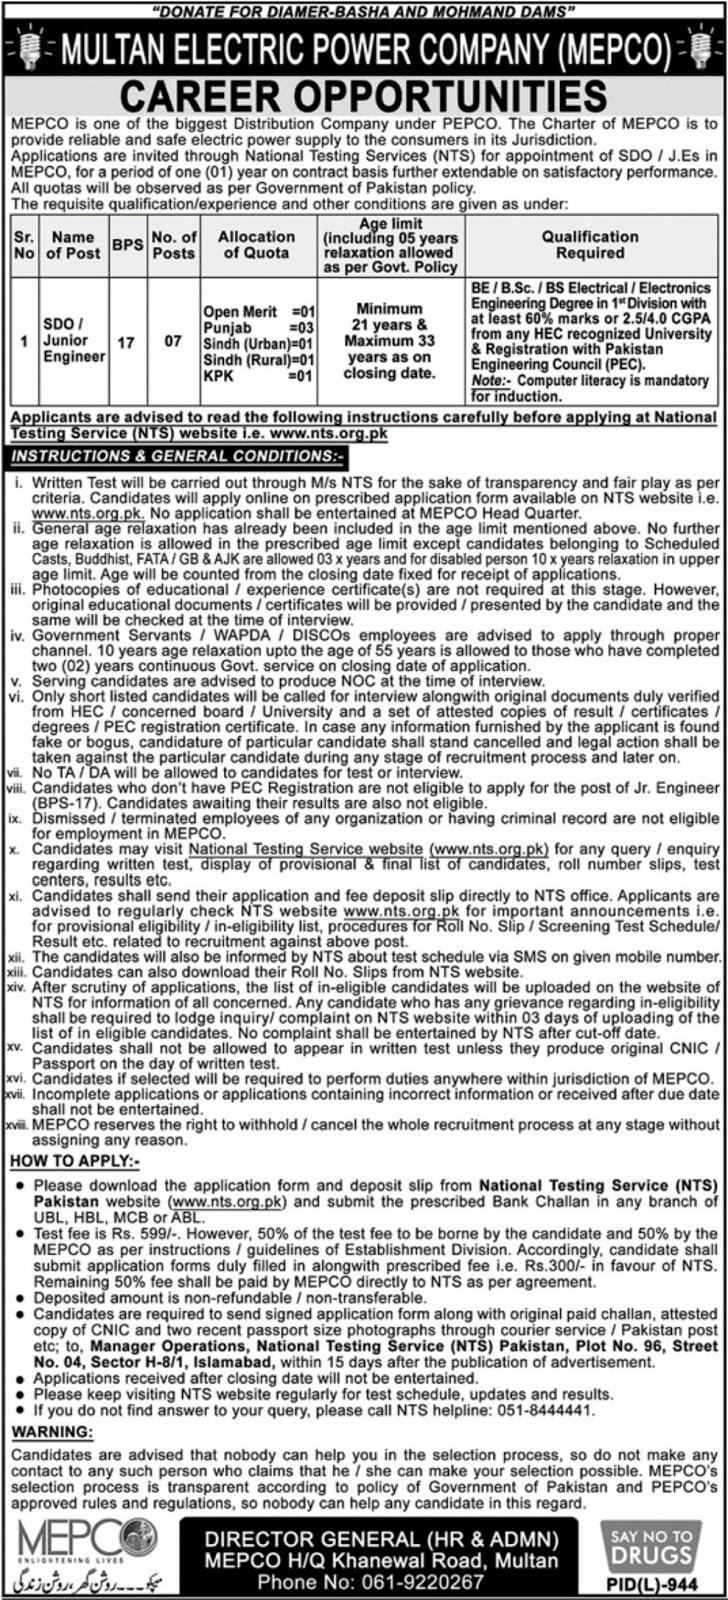 Multan Electric Power Company MEPCO Jobs 2019 Wapda